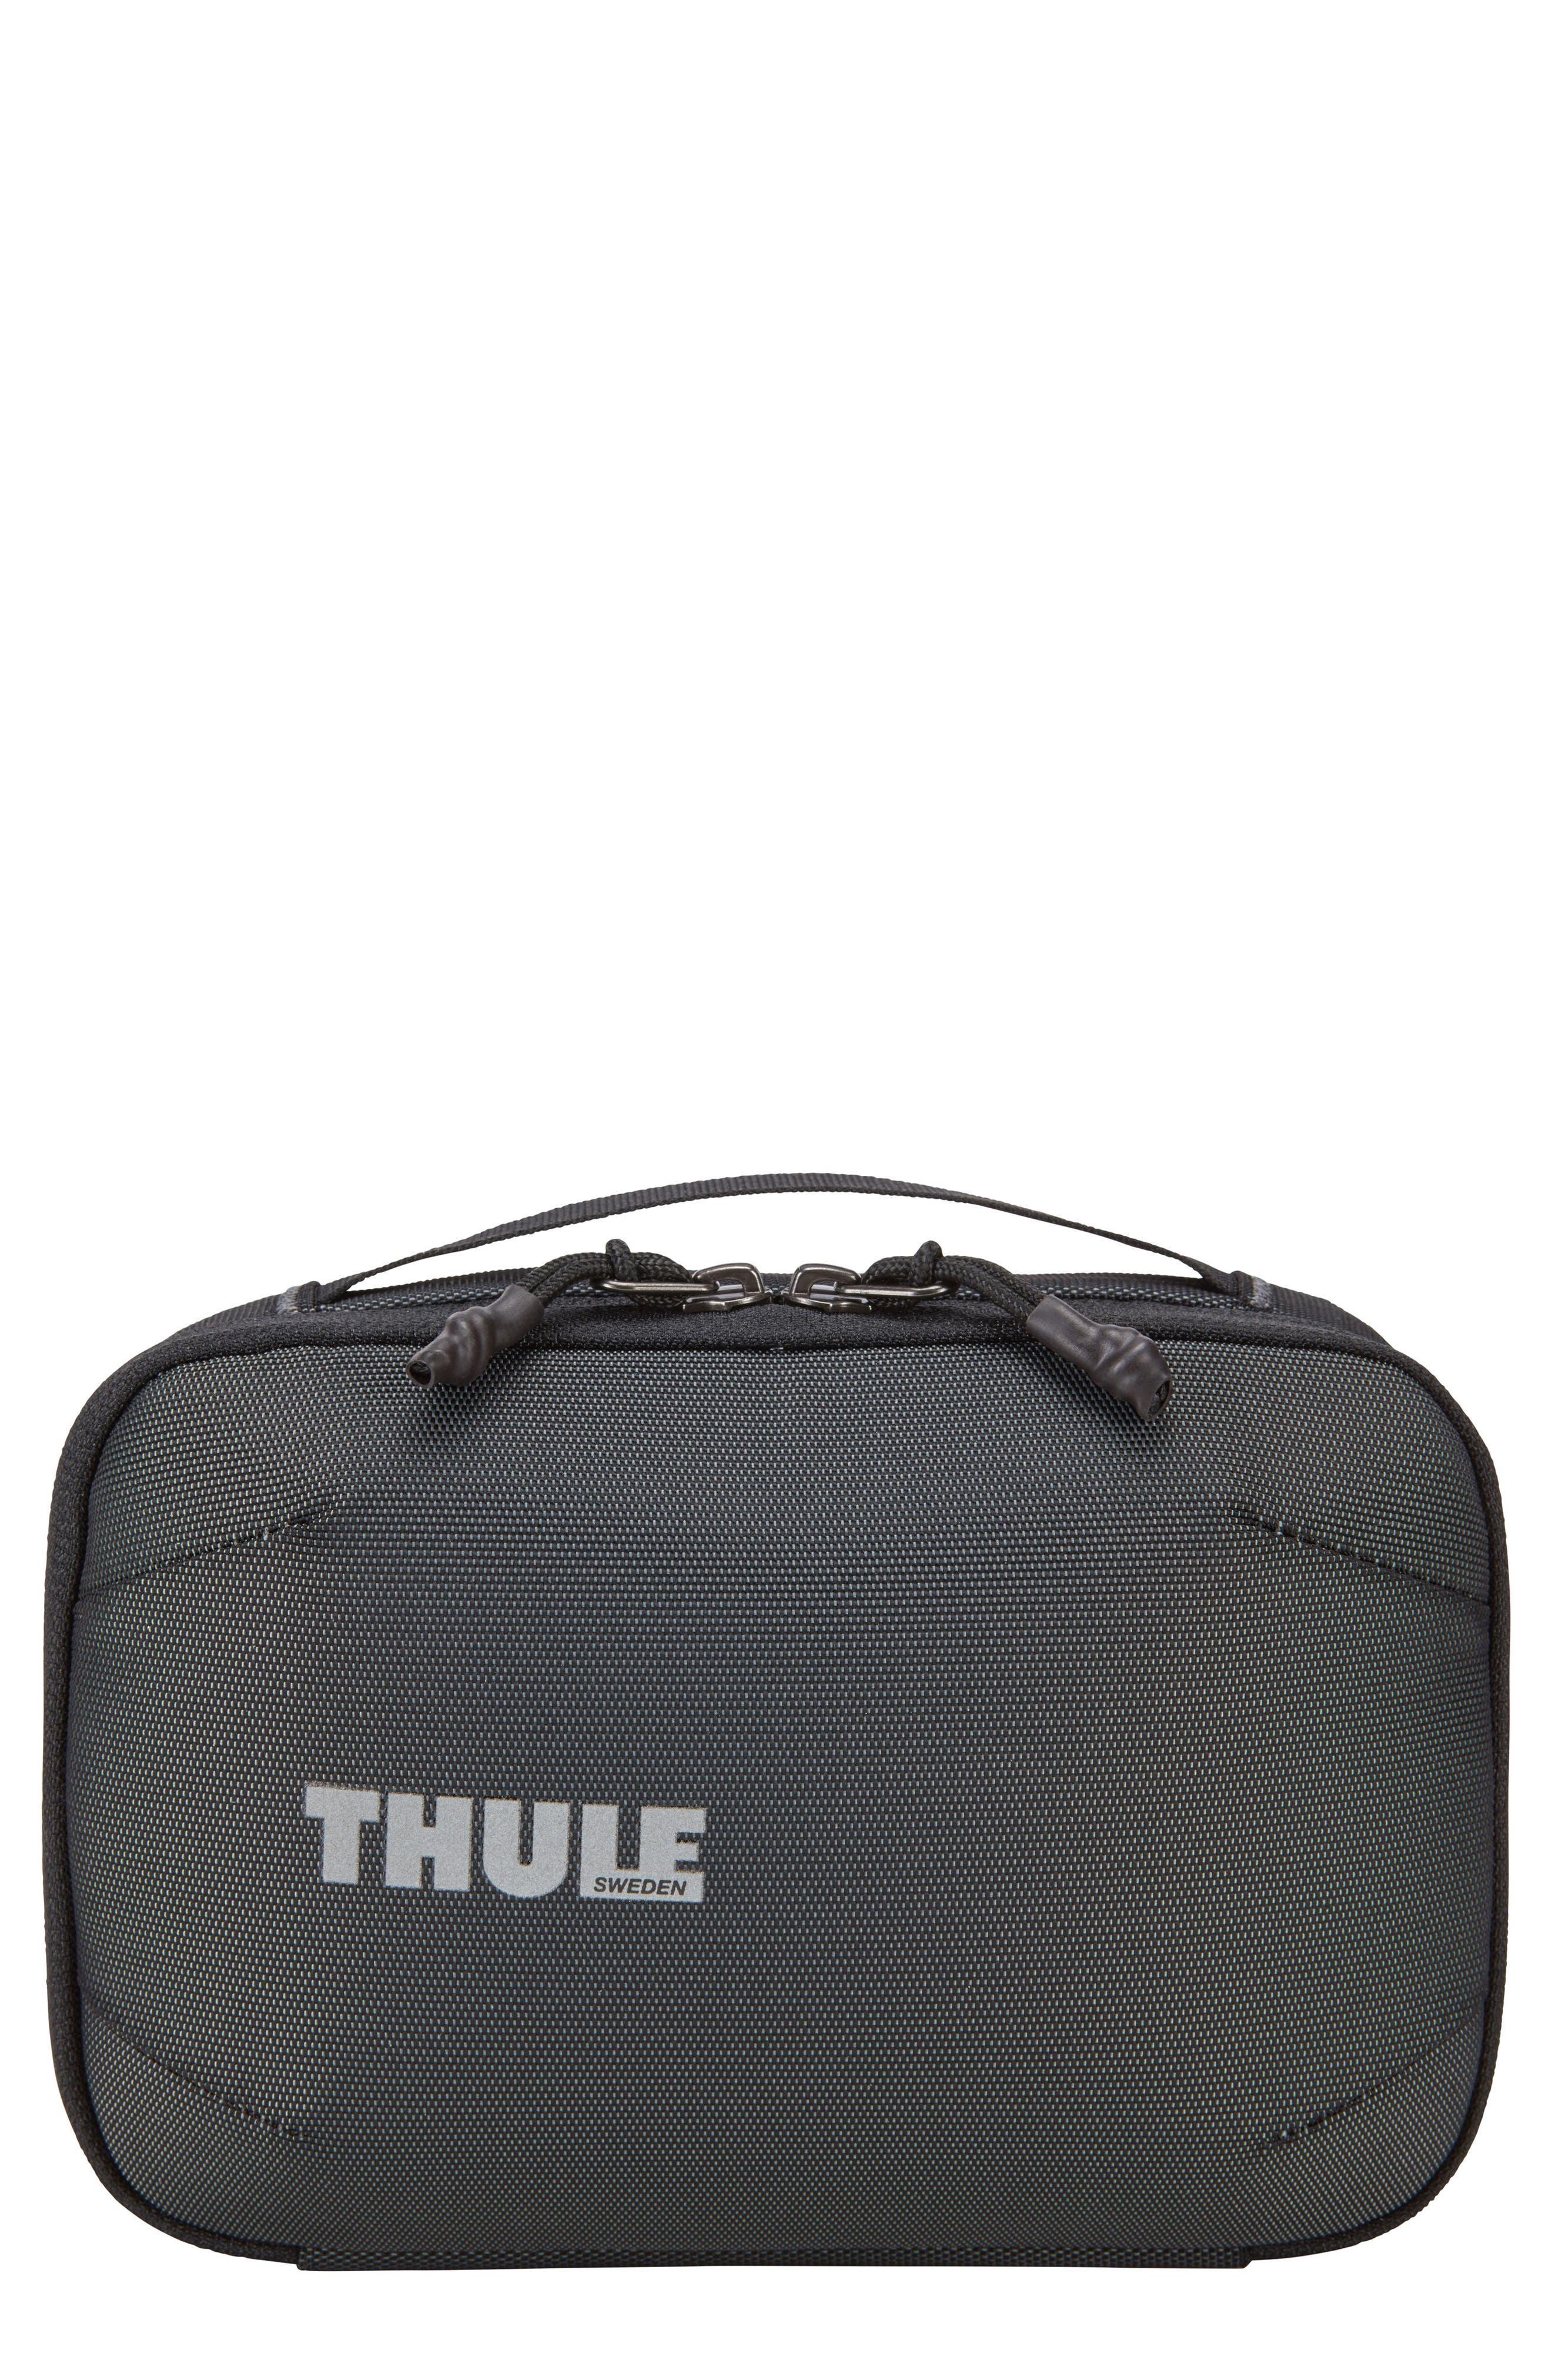 Main Image - Thule Subterra Powershuttle Travel Case